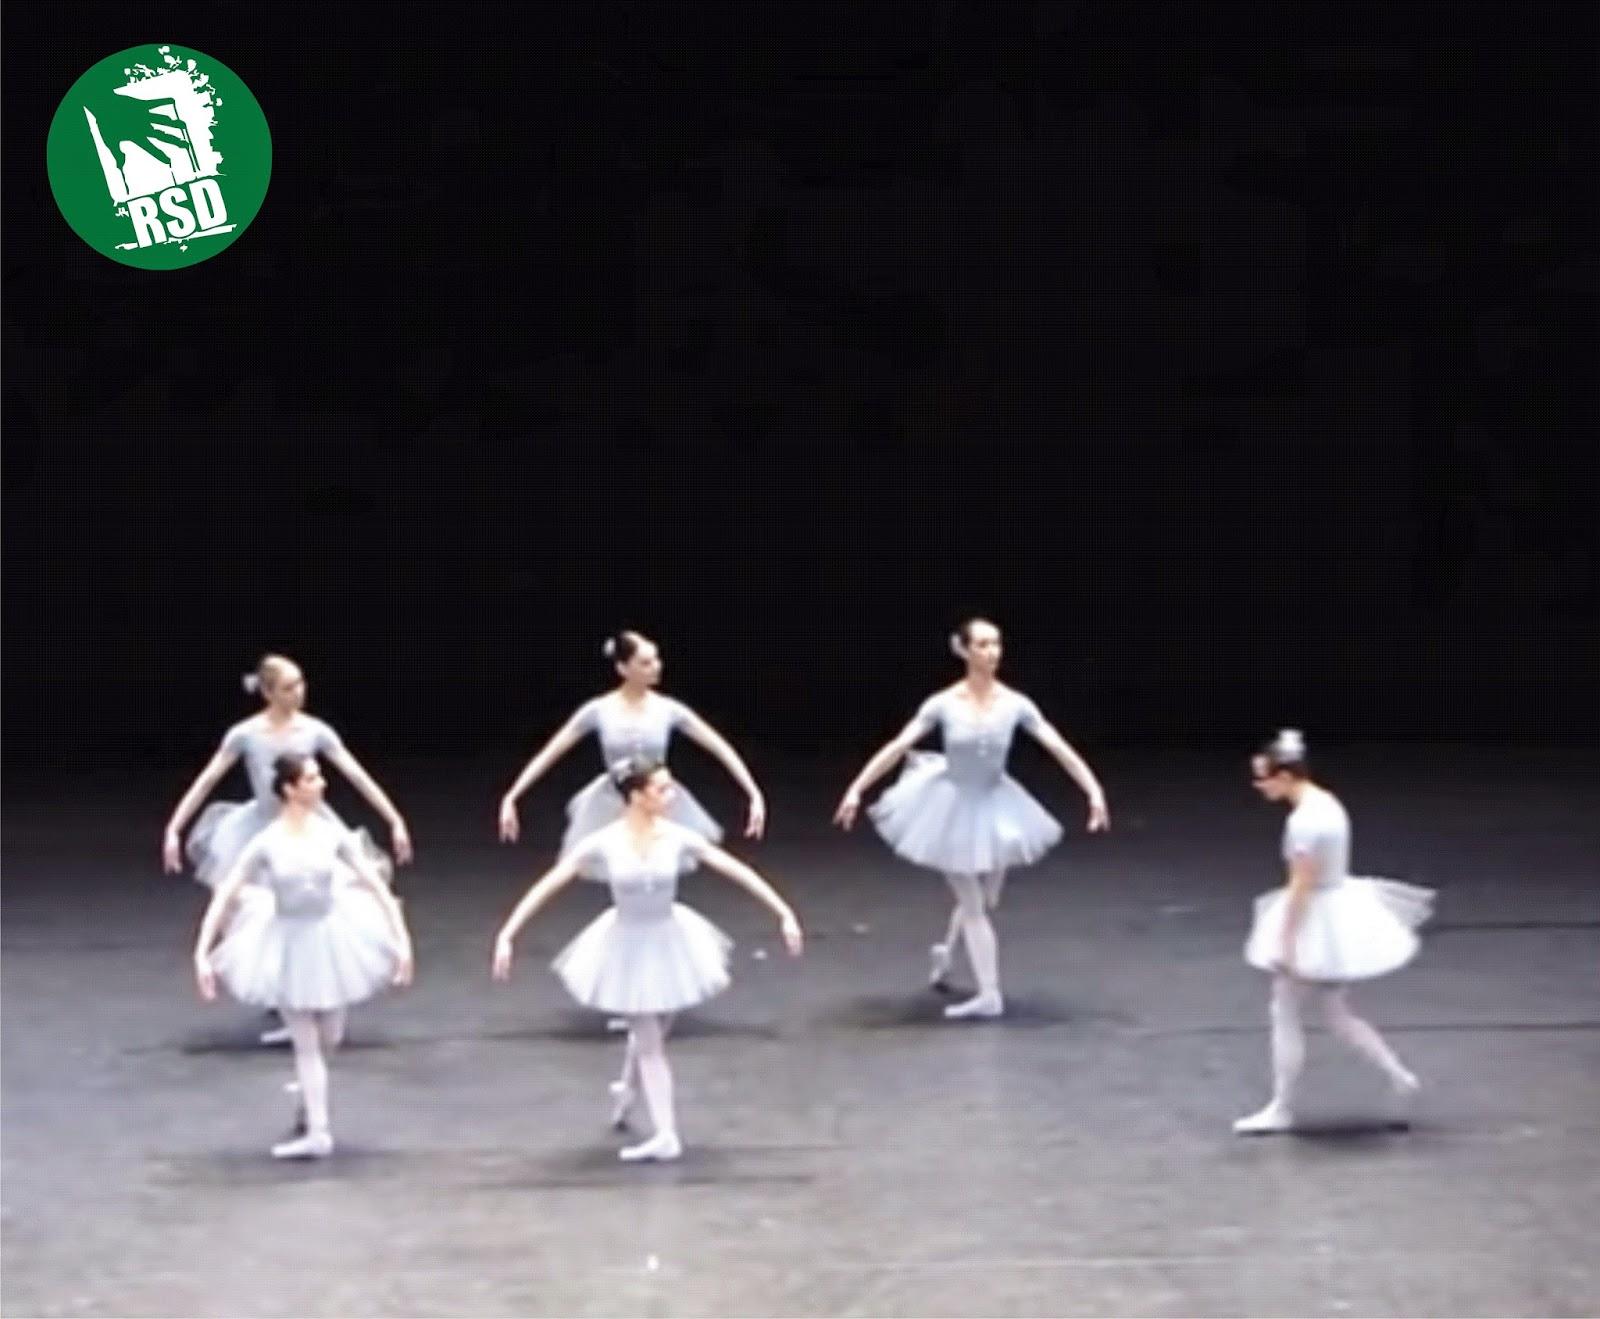 — Alô Gente! O Ballet pra dar gargalhada chegou! [Vídeo]